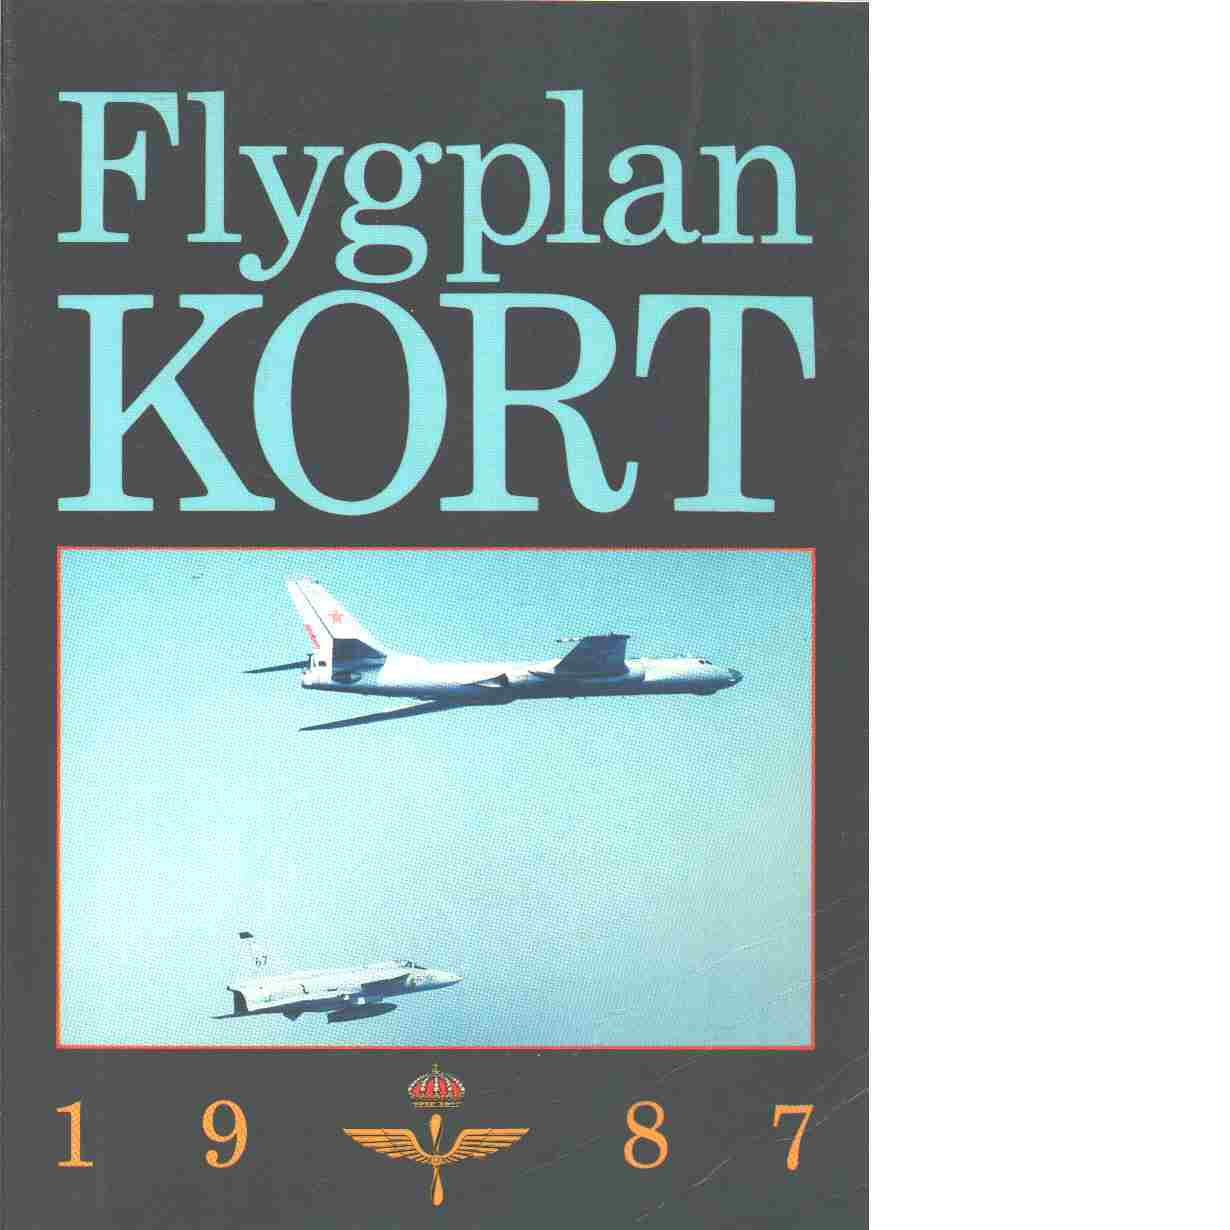 Flygplankort 1987 - Red.